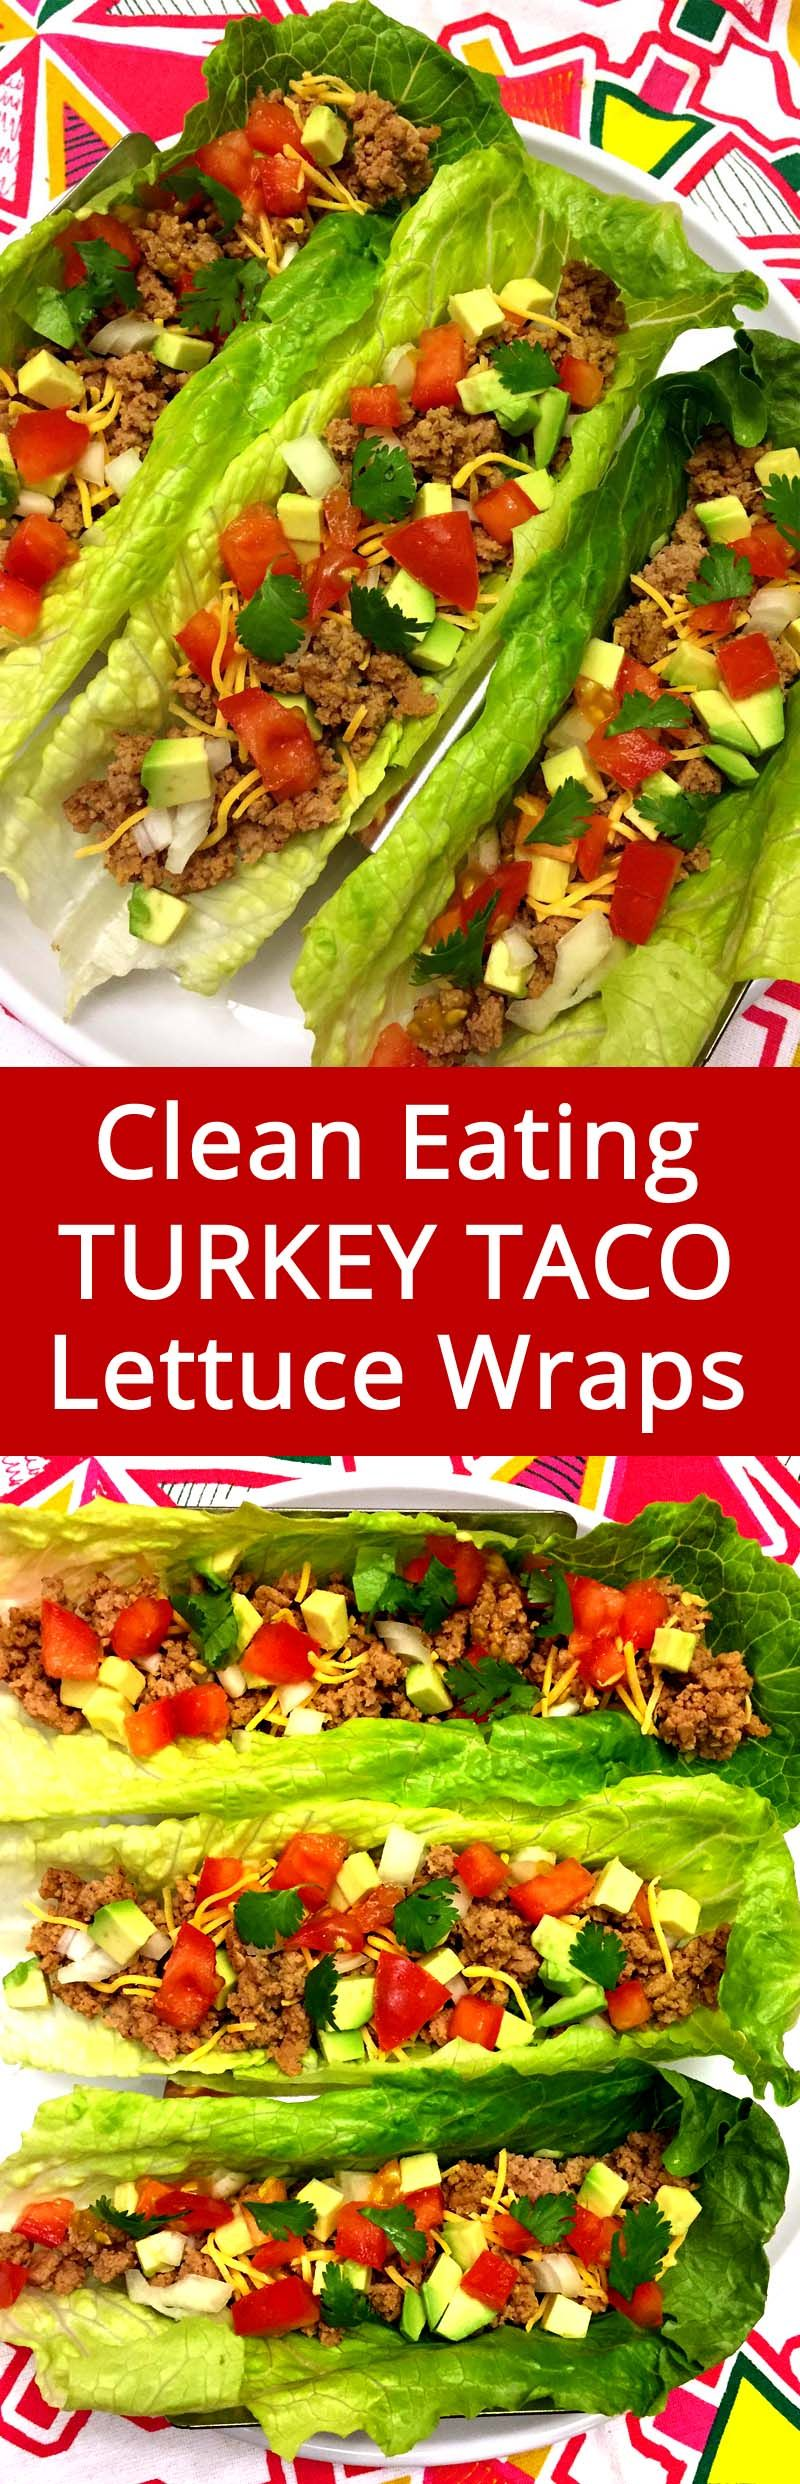 Healthy Turkey Taco Lettuce Wraps #groundturkeytacos